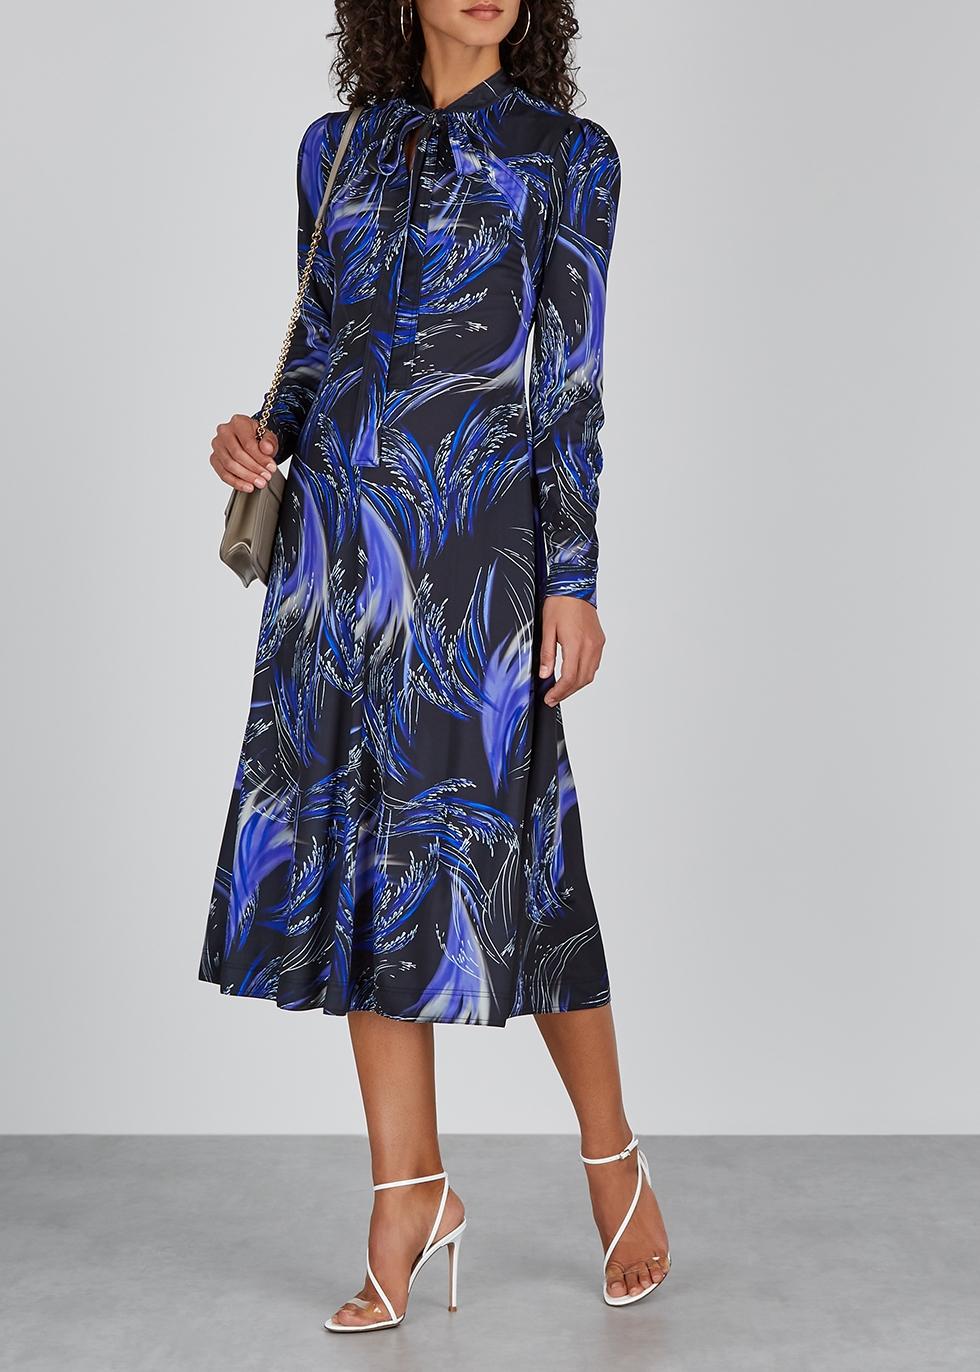 4d0b28b37d Designer Dresses   Designer Gowns - Harvey Nichols